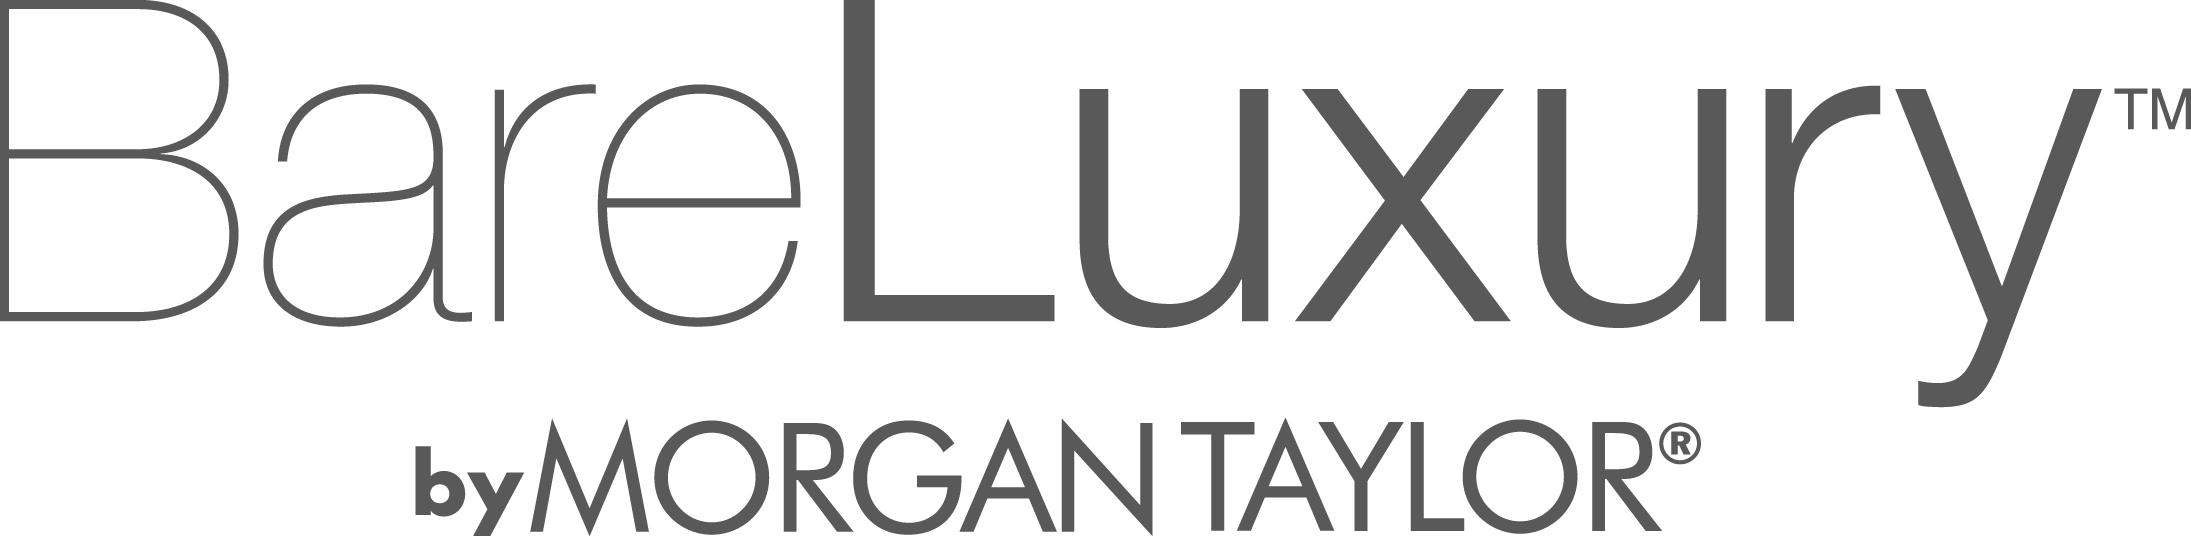 bareluxury-logo-wtag.jpg